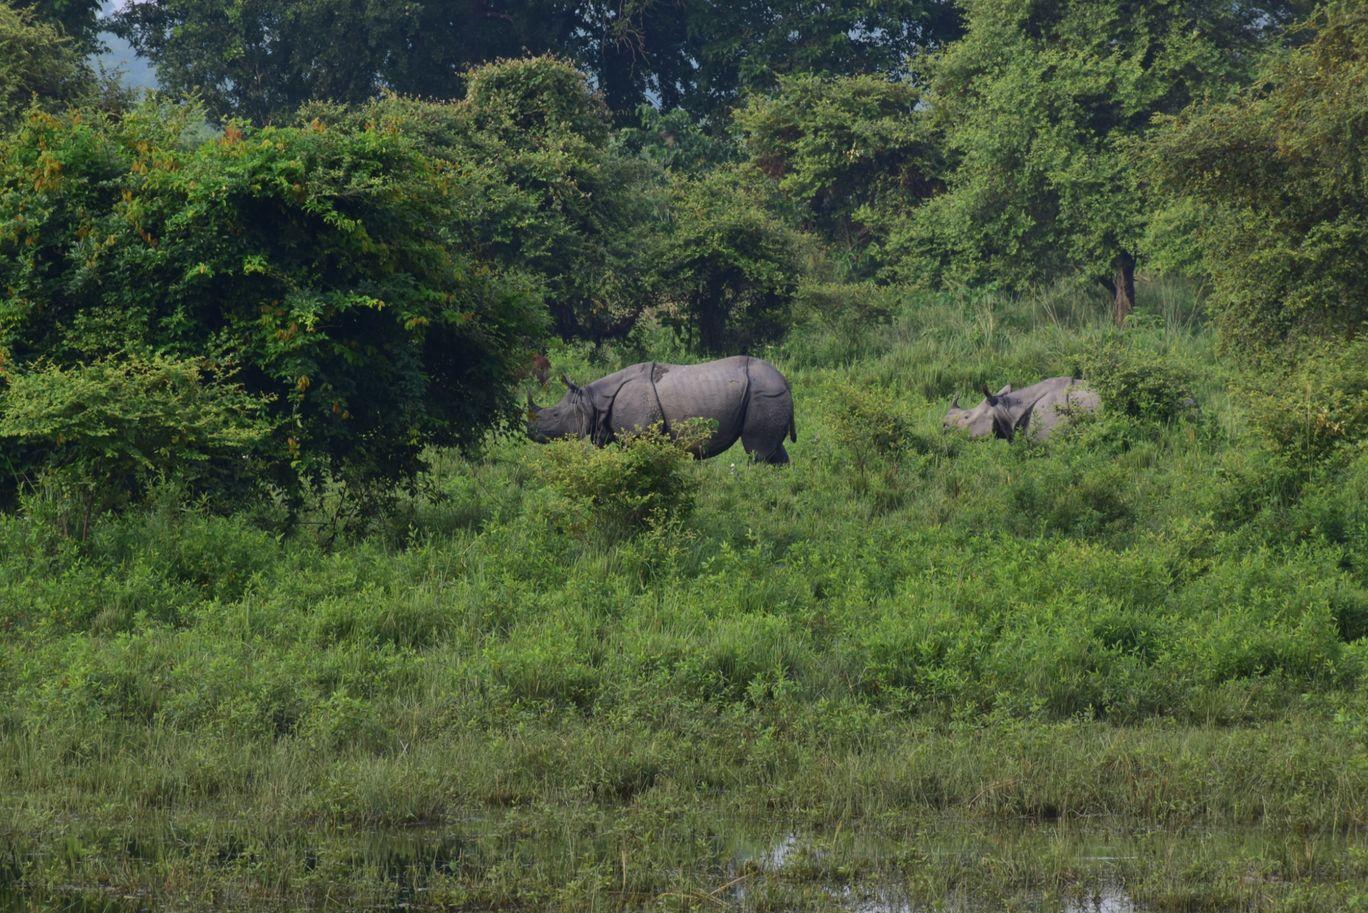 Photo of Kaziranga National Park By SUBIN K S